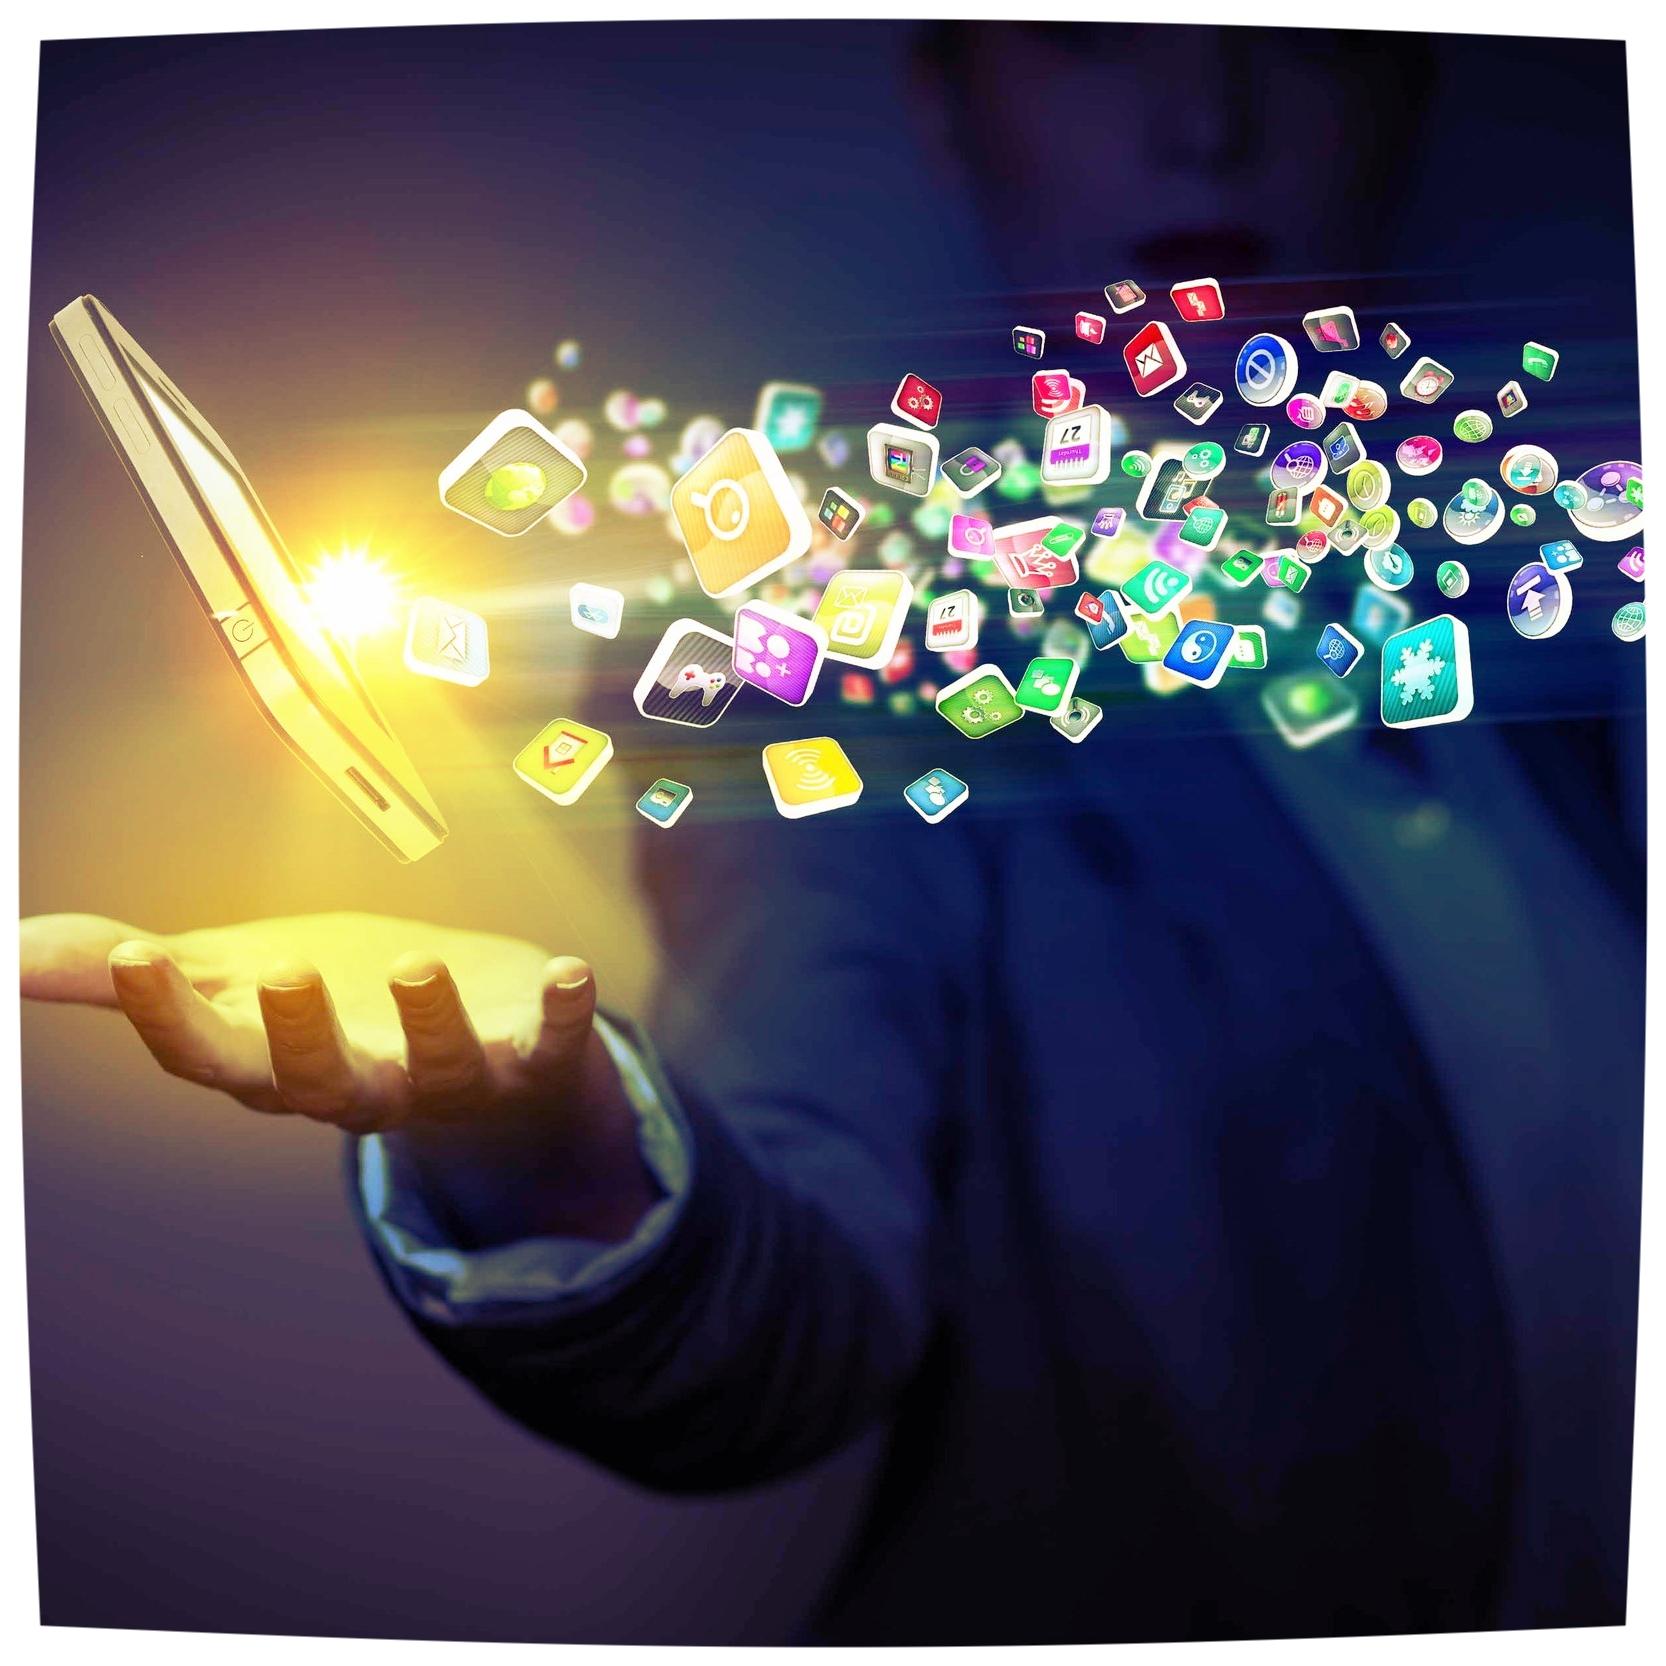 Publishing Services - Brand PartnershipsContent DevelopmentIP LicensingRevenue OptimizationUser Acquisition